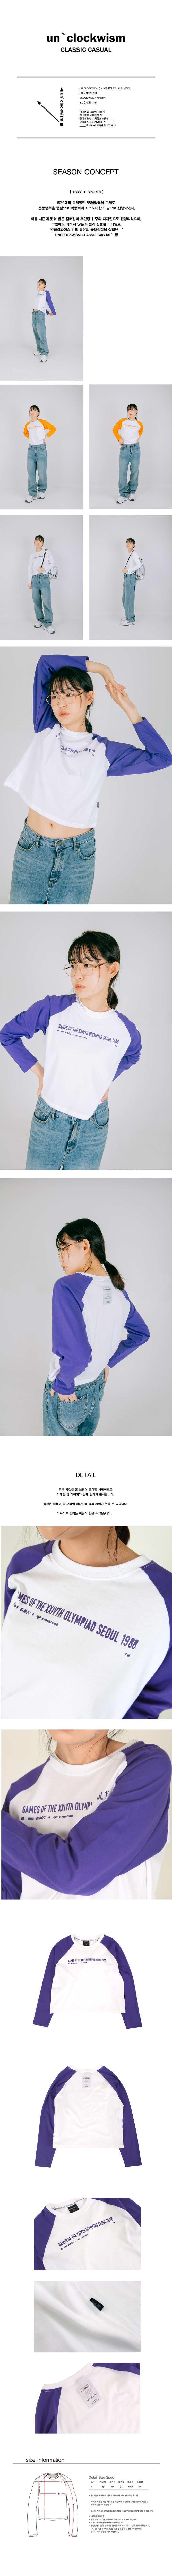 Olympiad Printing Raglan t-shirt_purple.jpg